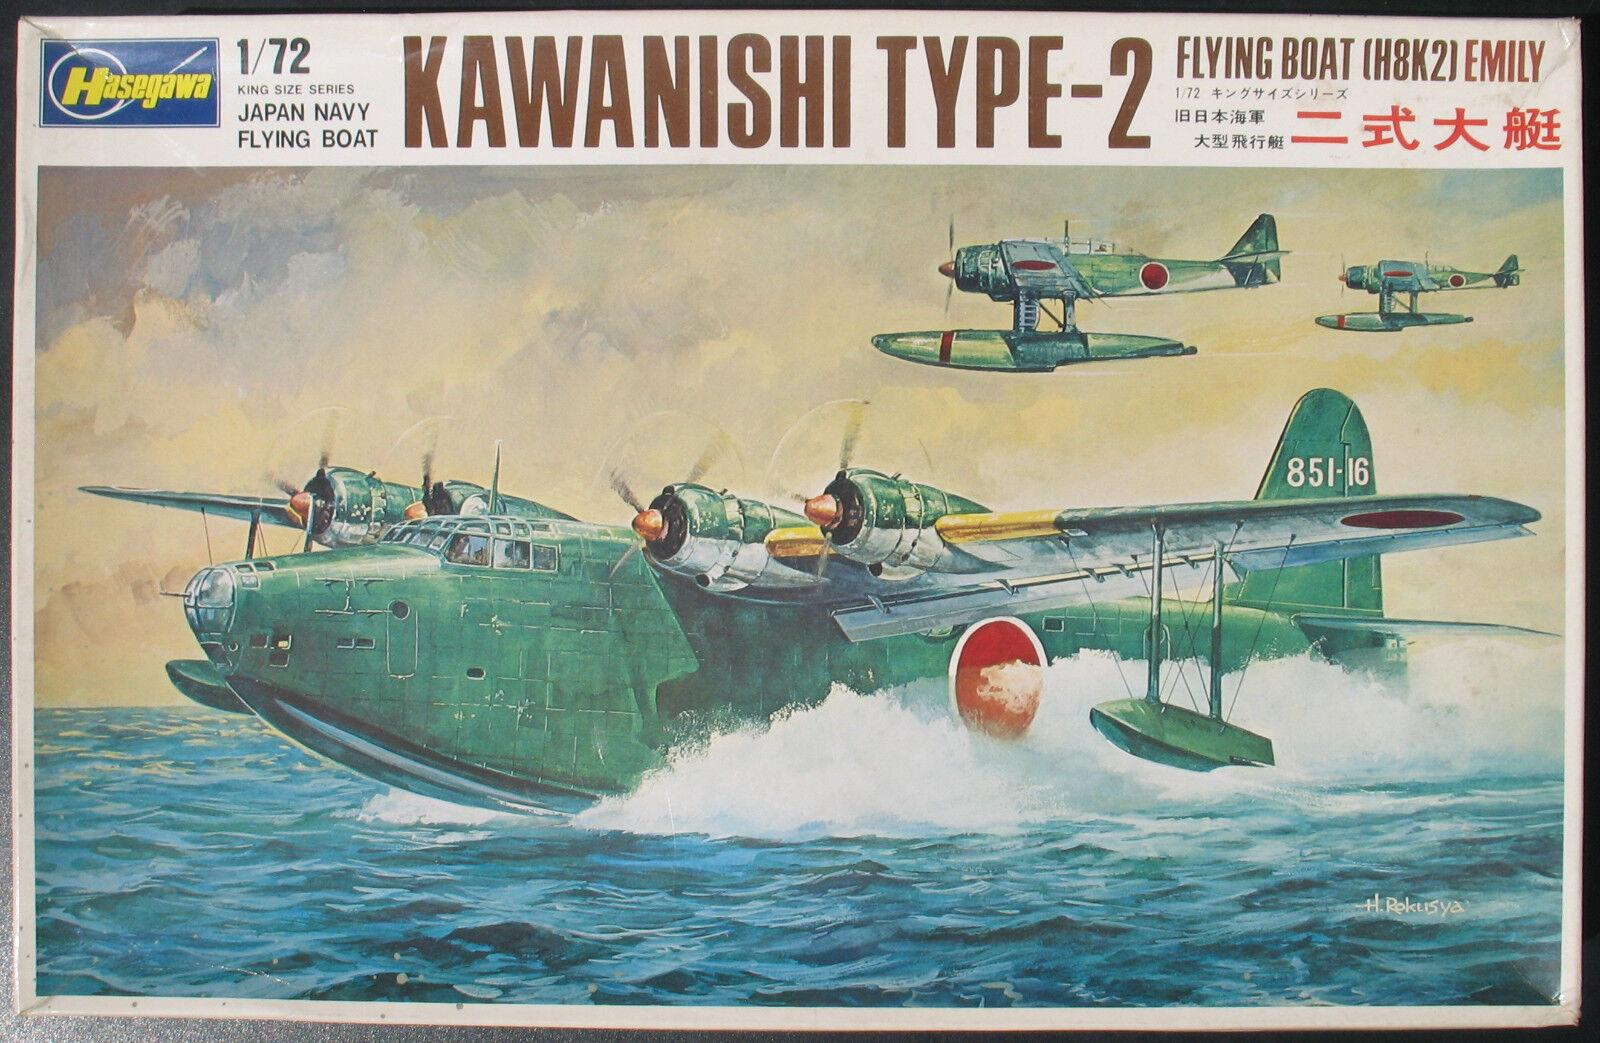 Hasegawa JS 21 1200 - KAWANISHI TYPE-2 (H8K2) EMILY- 1 72 - Flugzeug Bausatz KIT    Neue Produkte im Jahr 2019